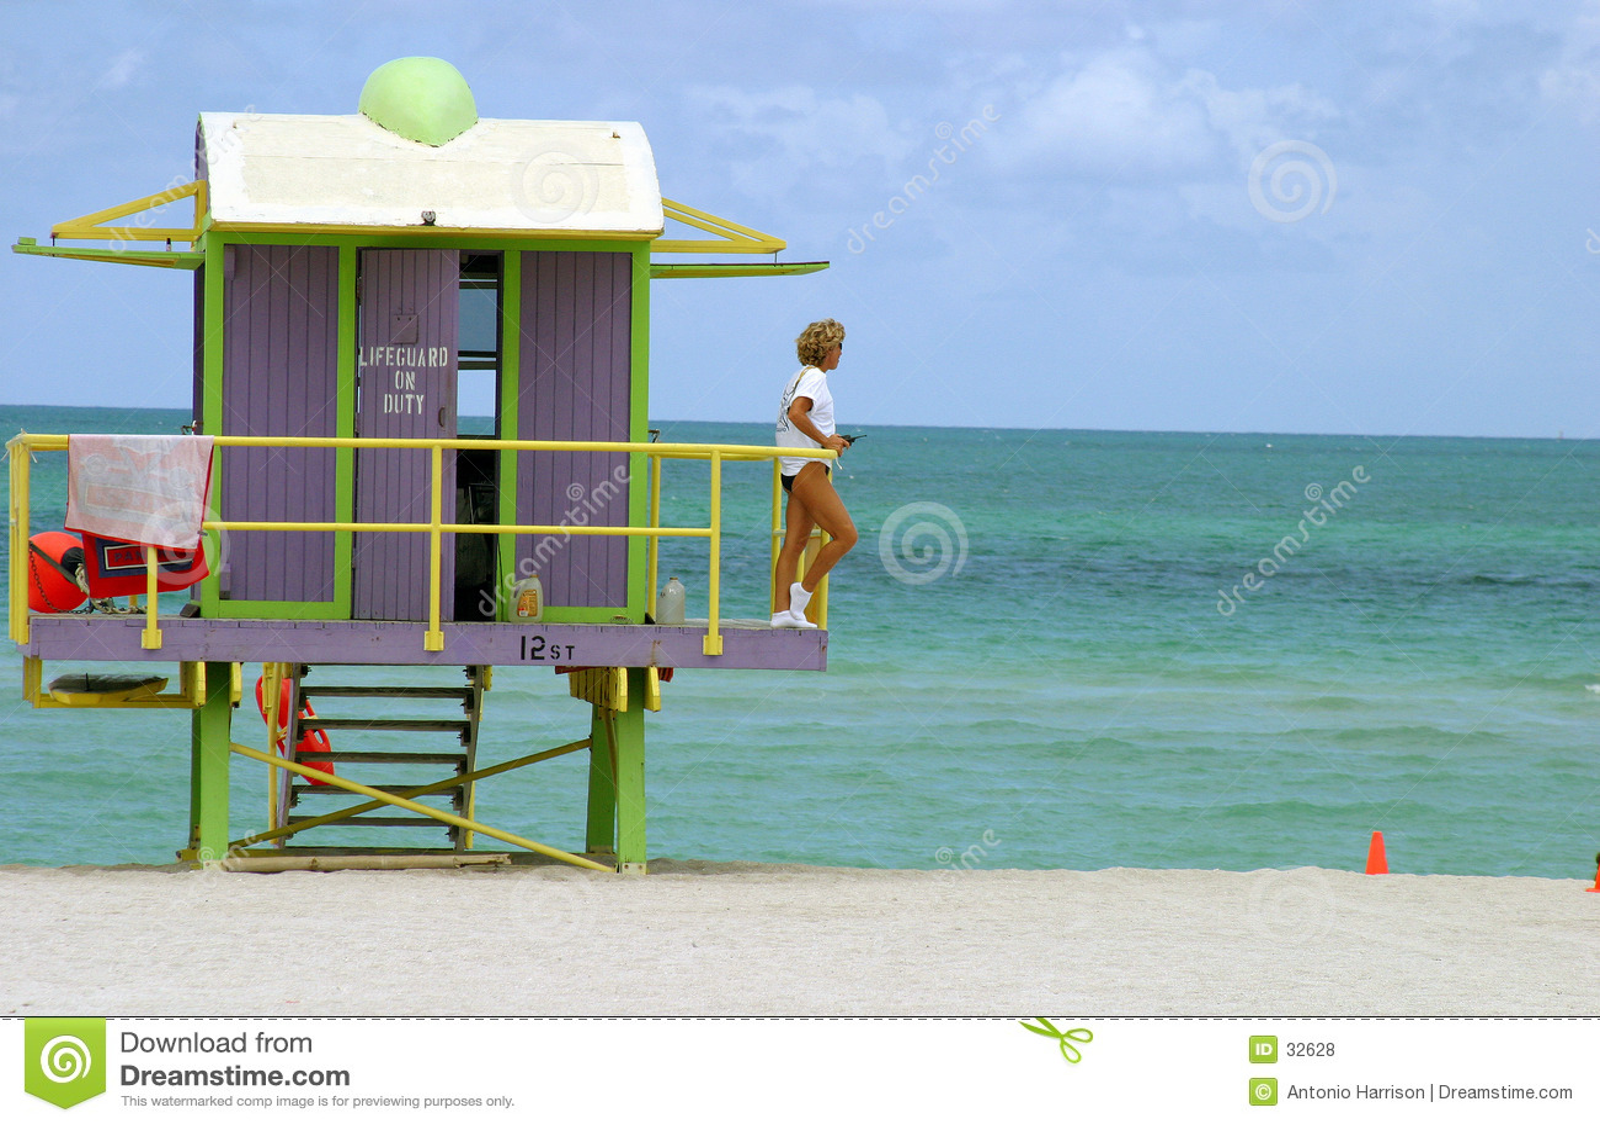 Södra strandguard